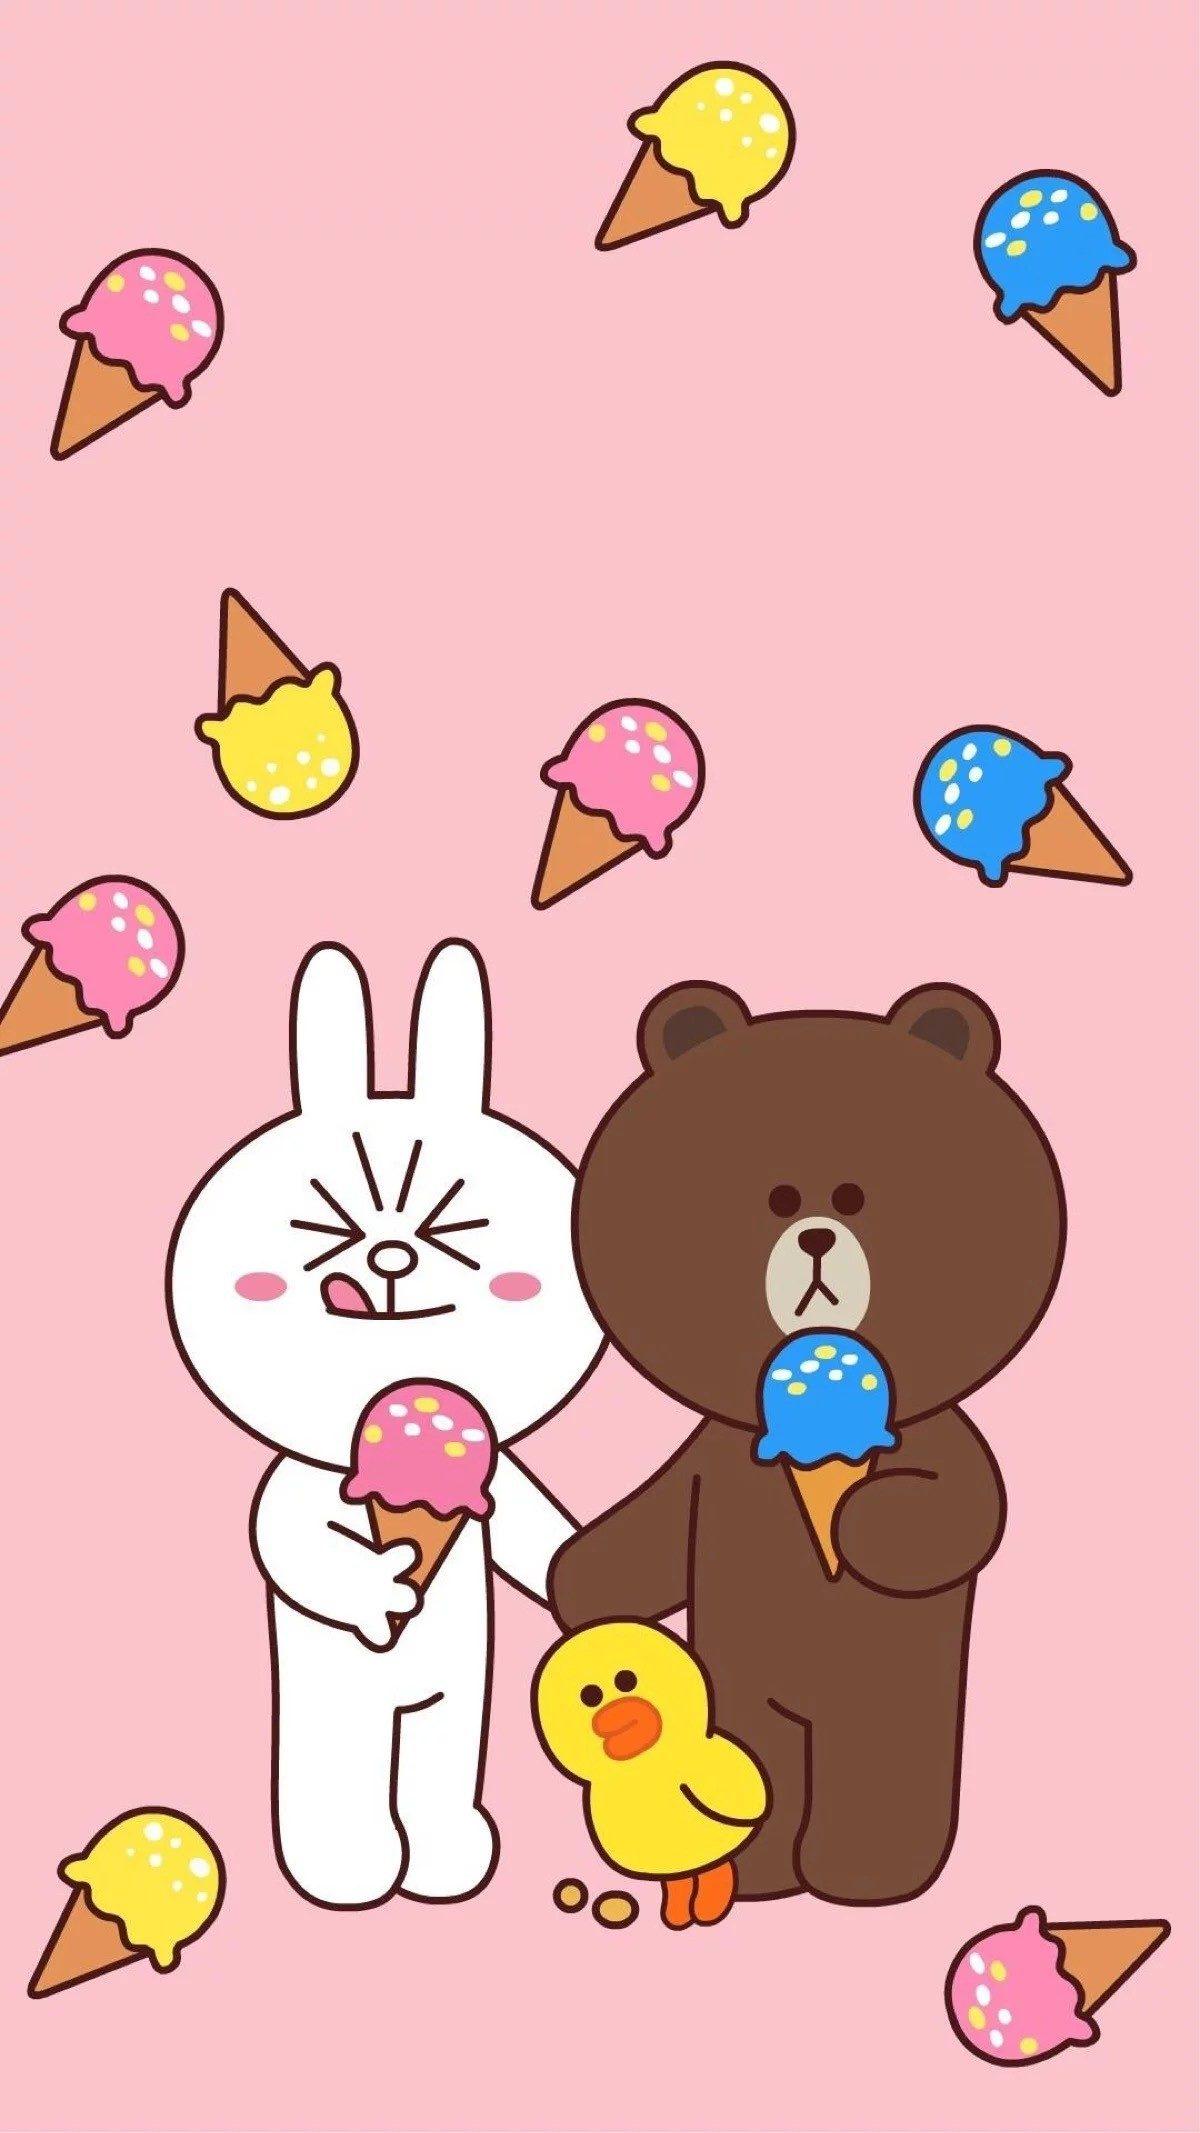 Phone Wallpapers Iphone 7 Bunny Cartoon Screen Funds Love